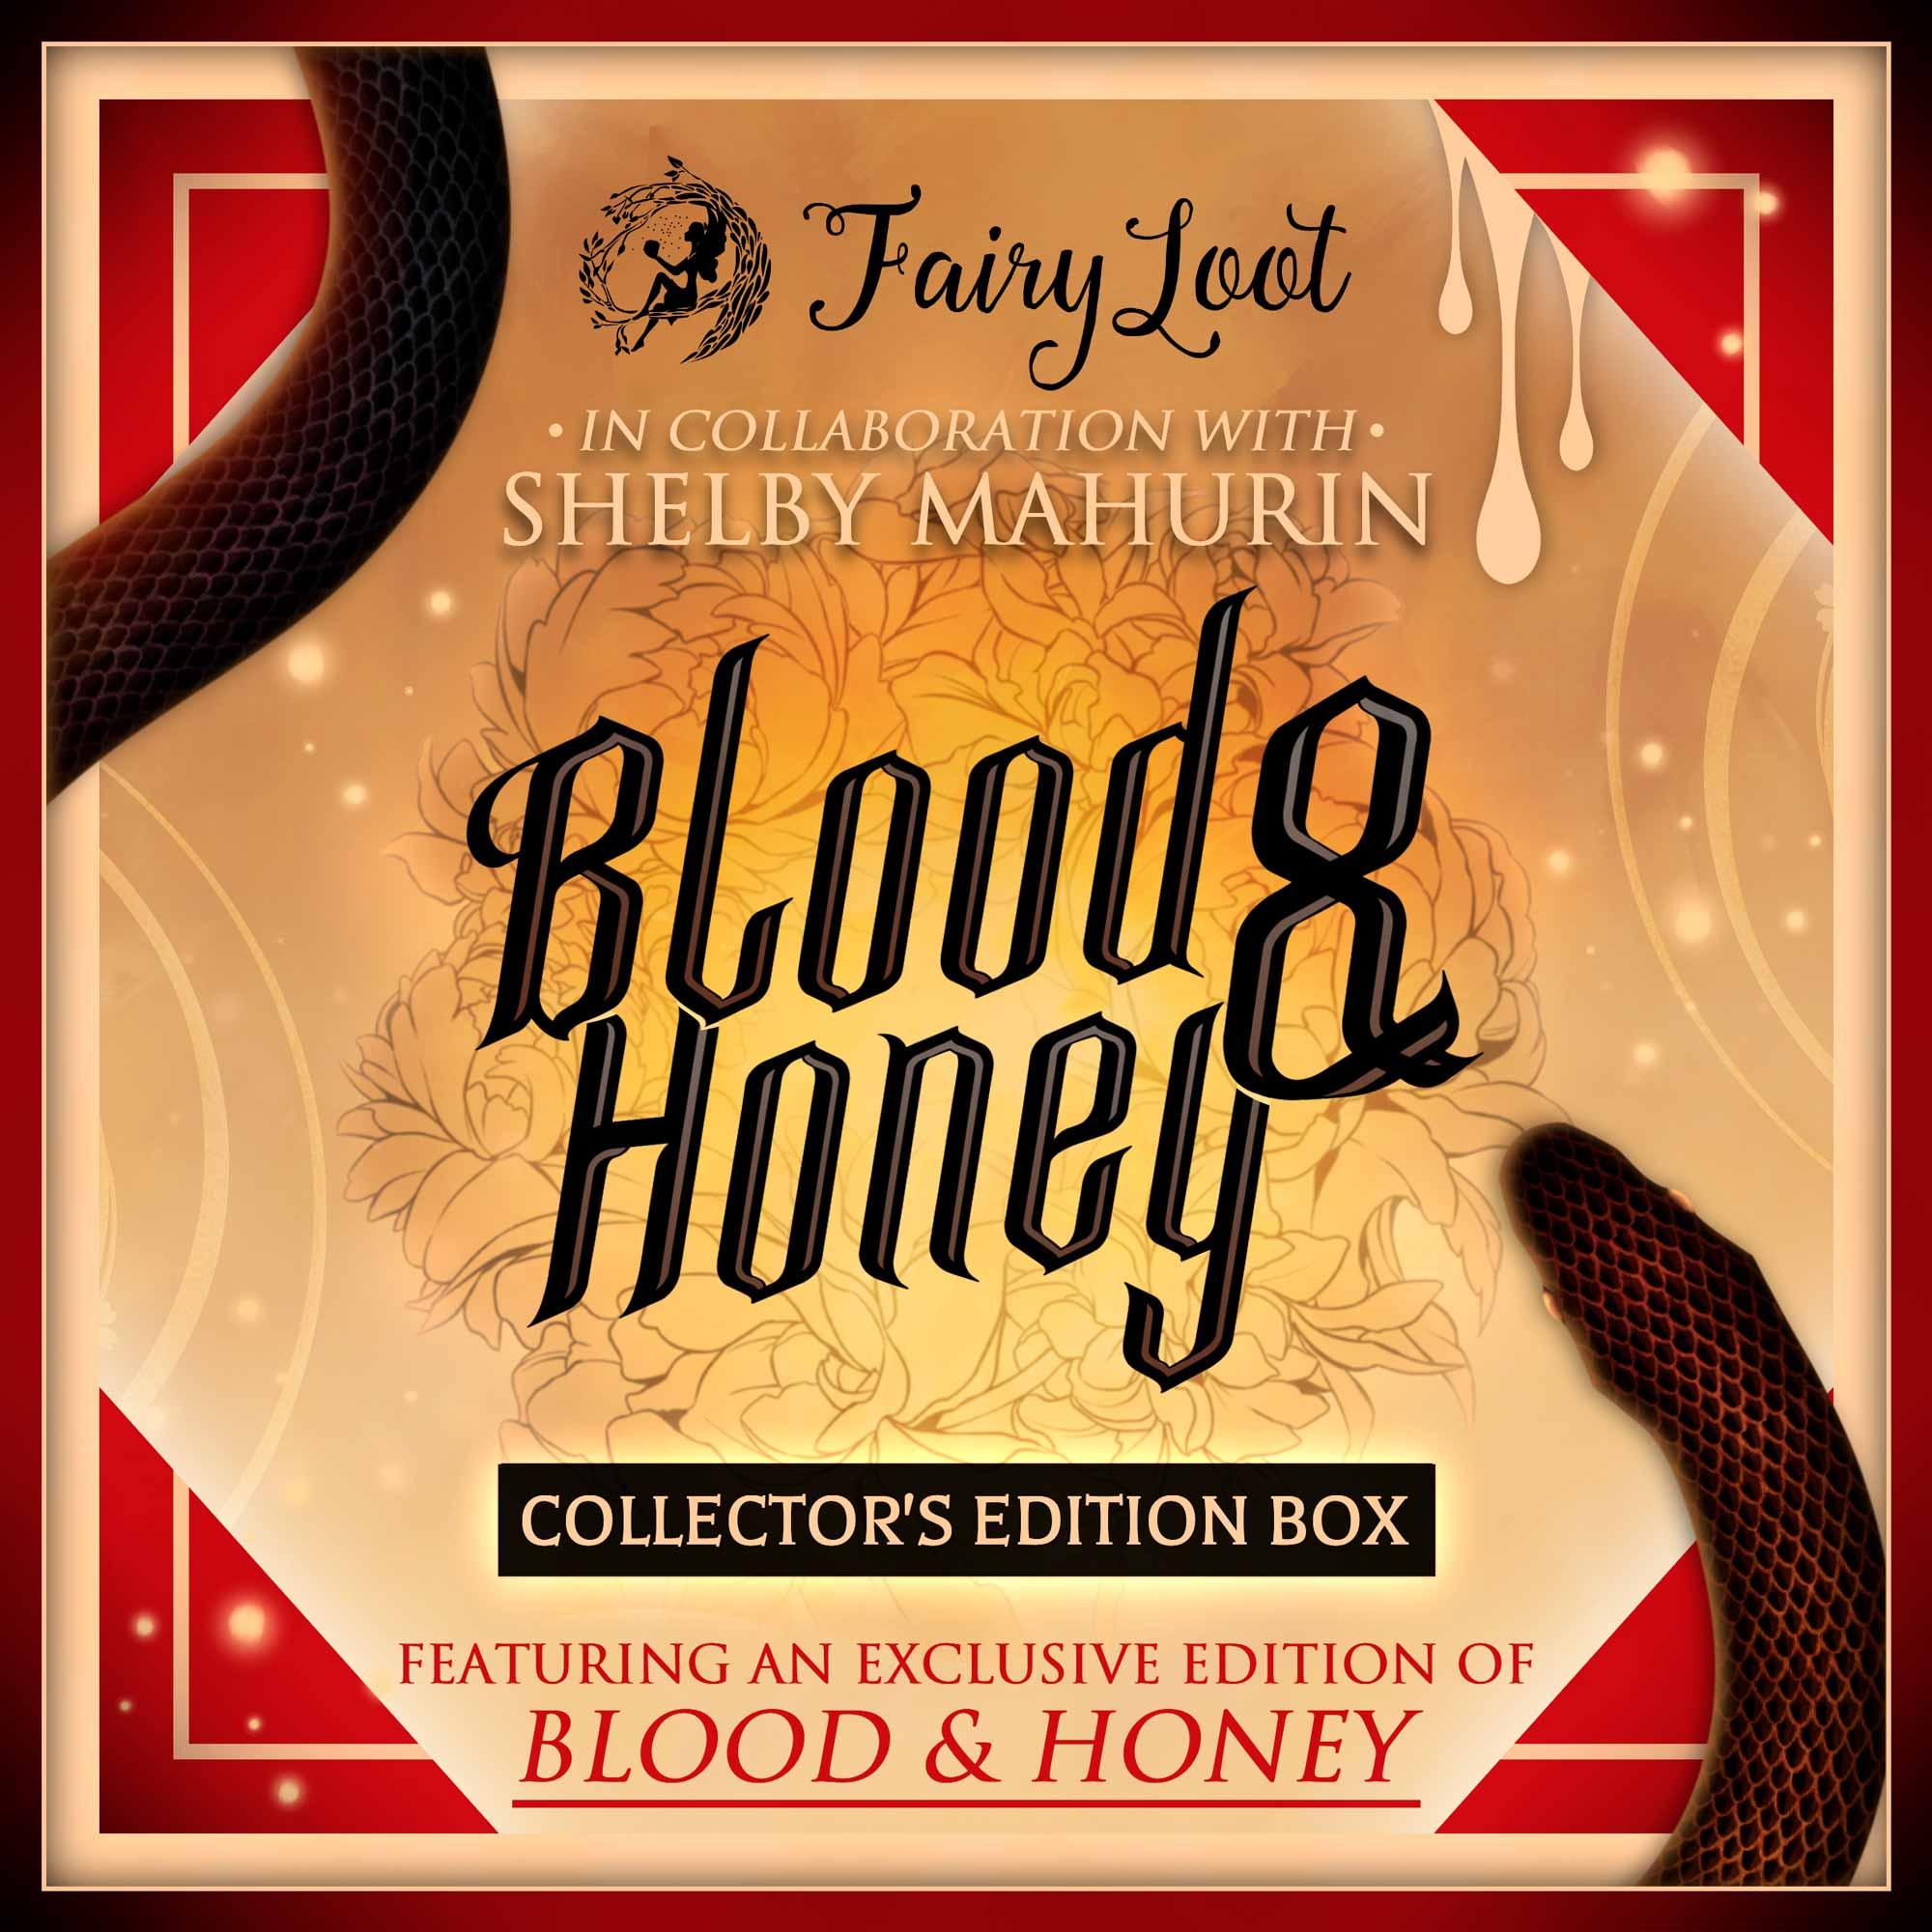 THE BLOOD & HONEY BOX